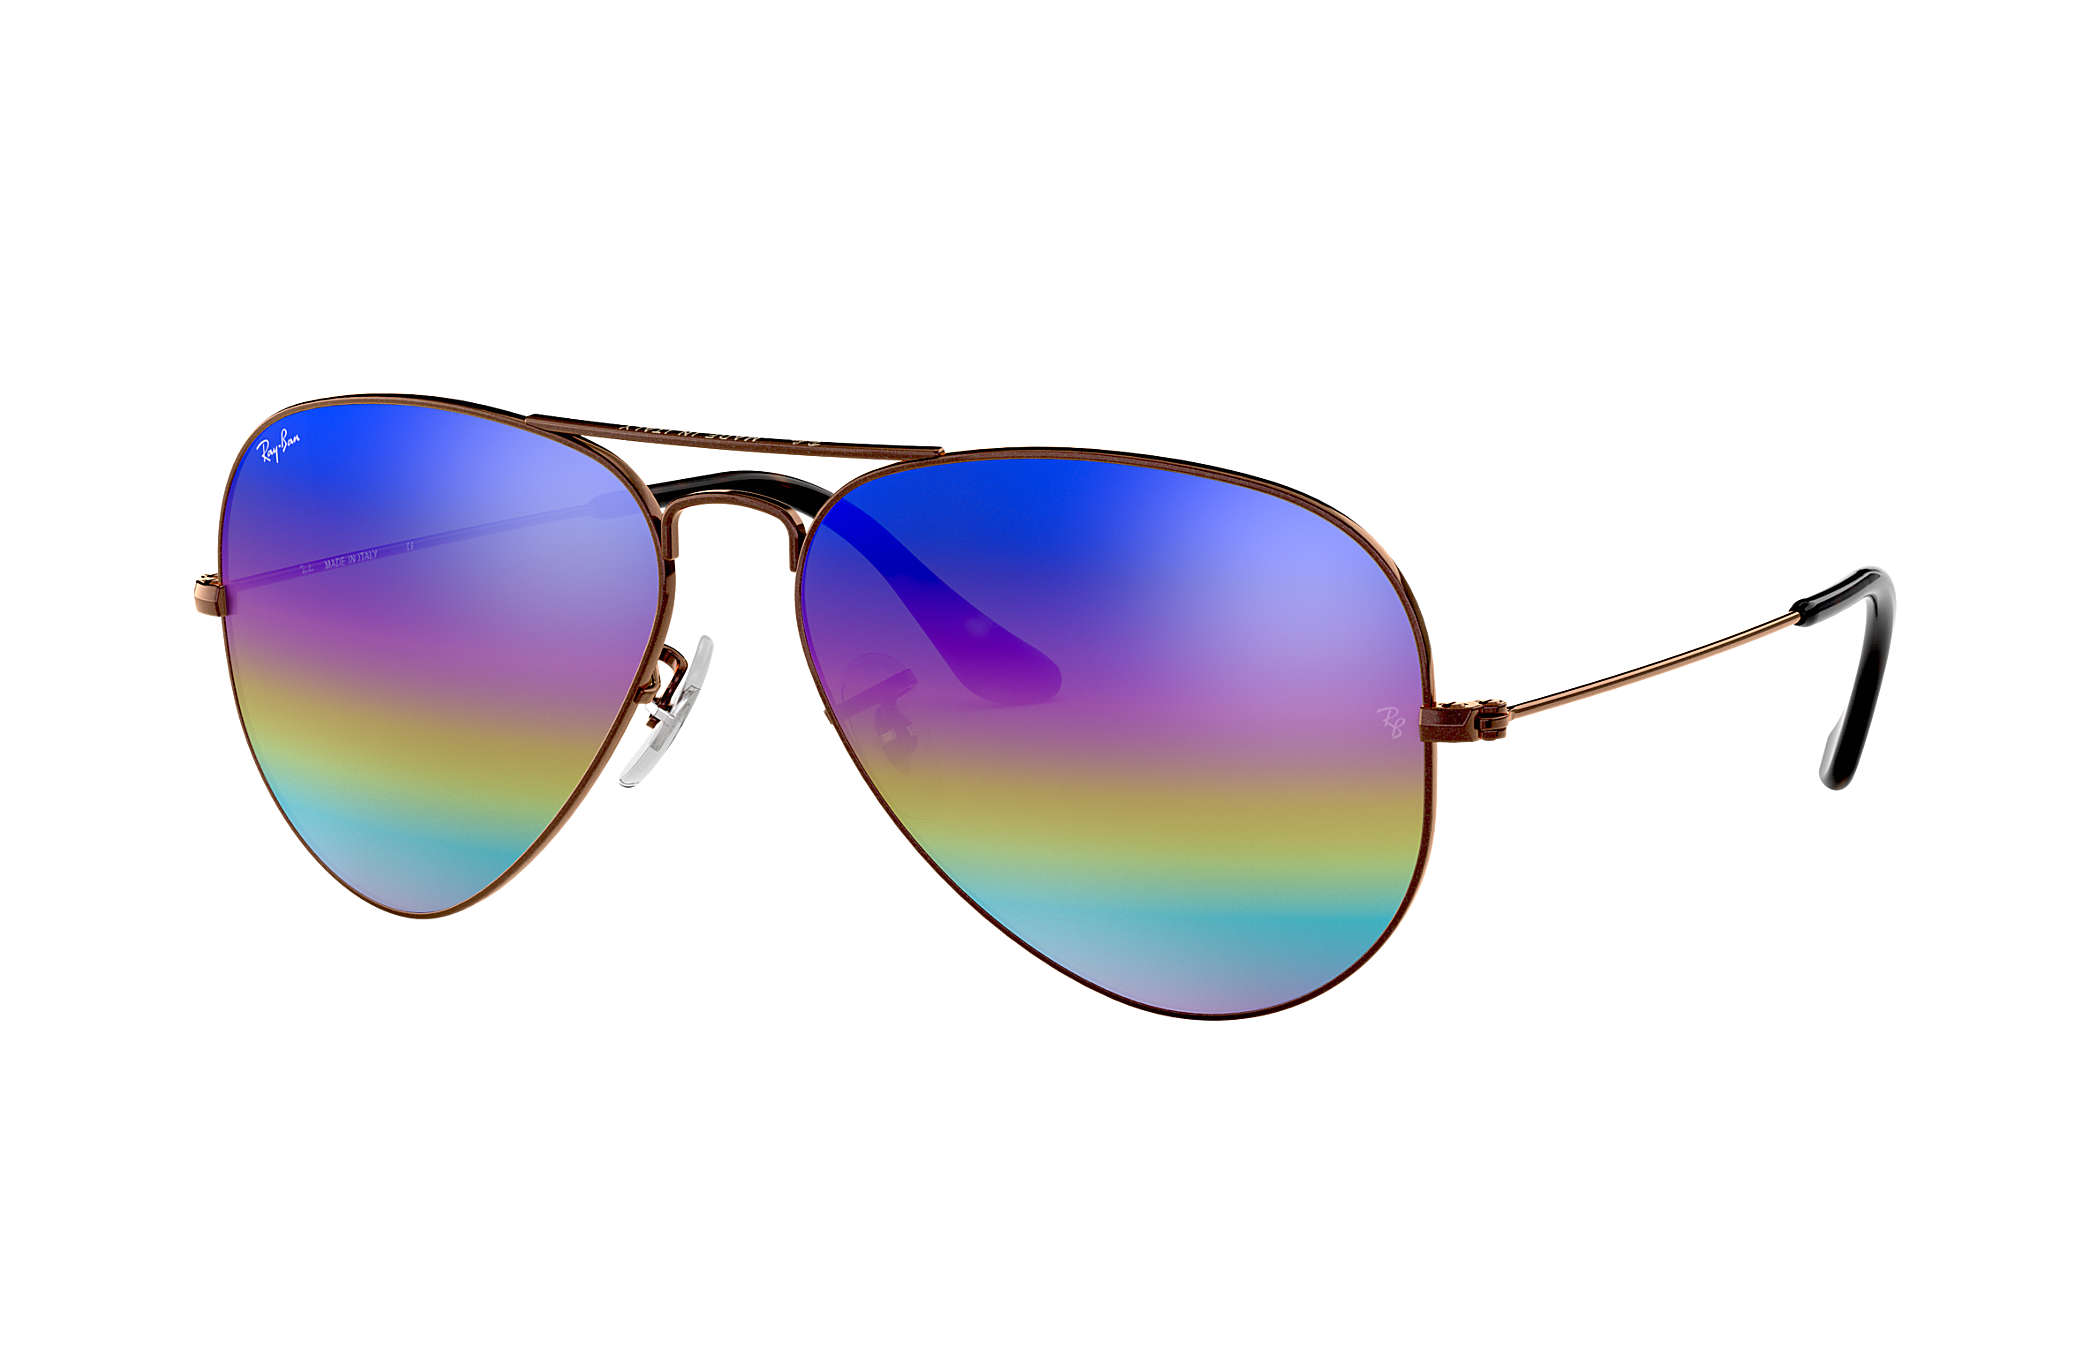 f7e405a31 Ray-Ban Aviator Mineral Flash Lenses RB3025 Bronze-Copper - Metal ...